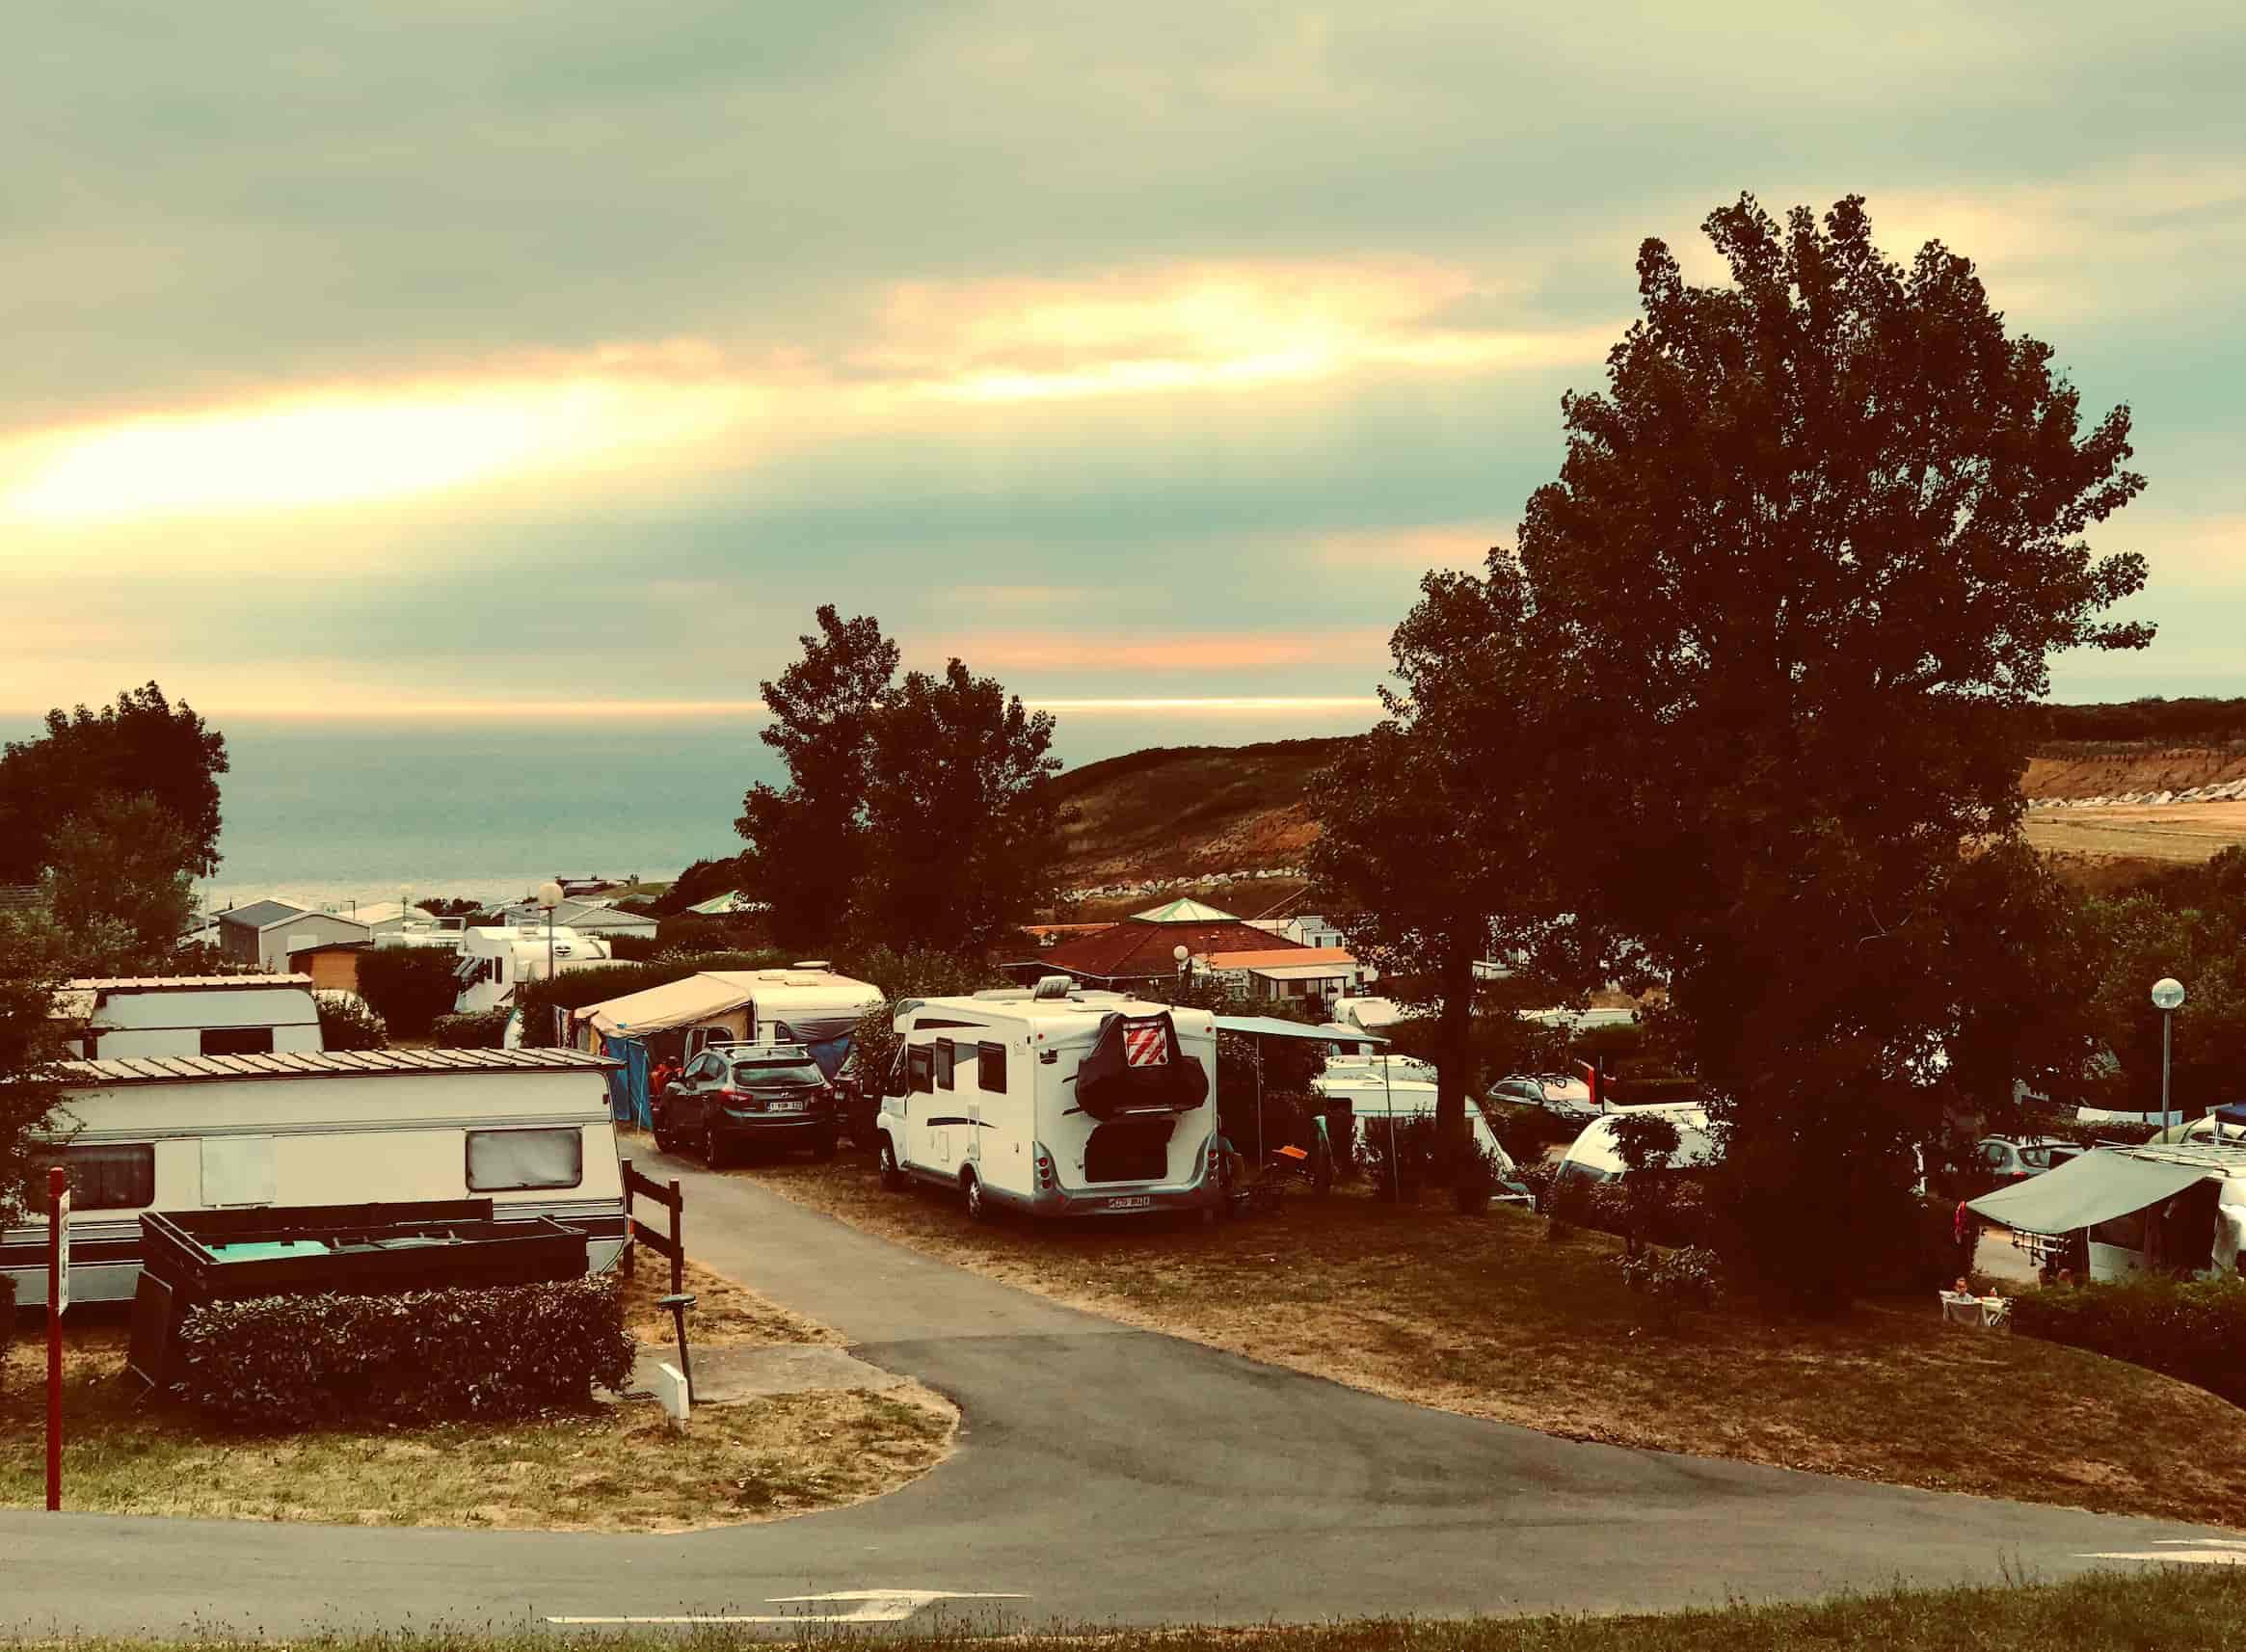 Blick über den Campingplatz in Equihen Plage